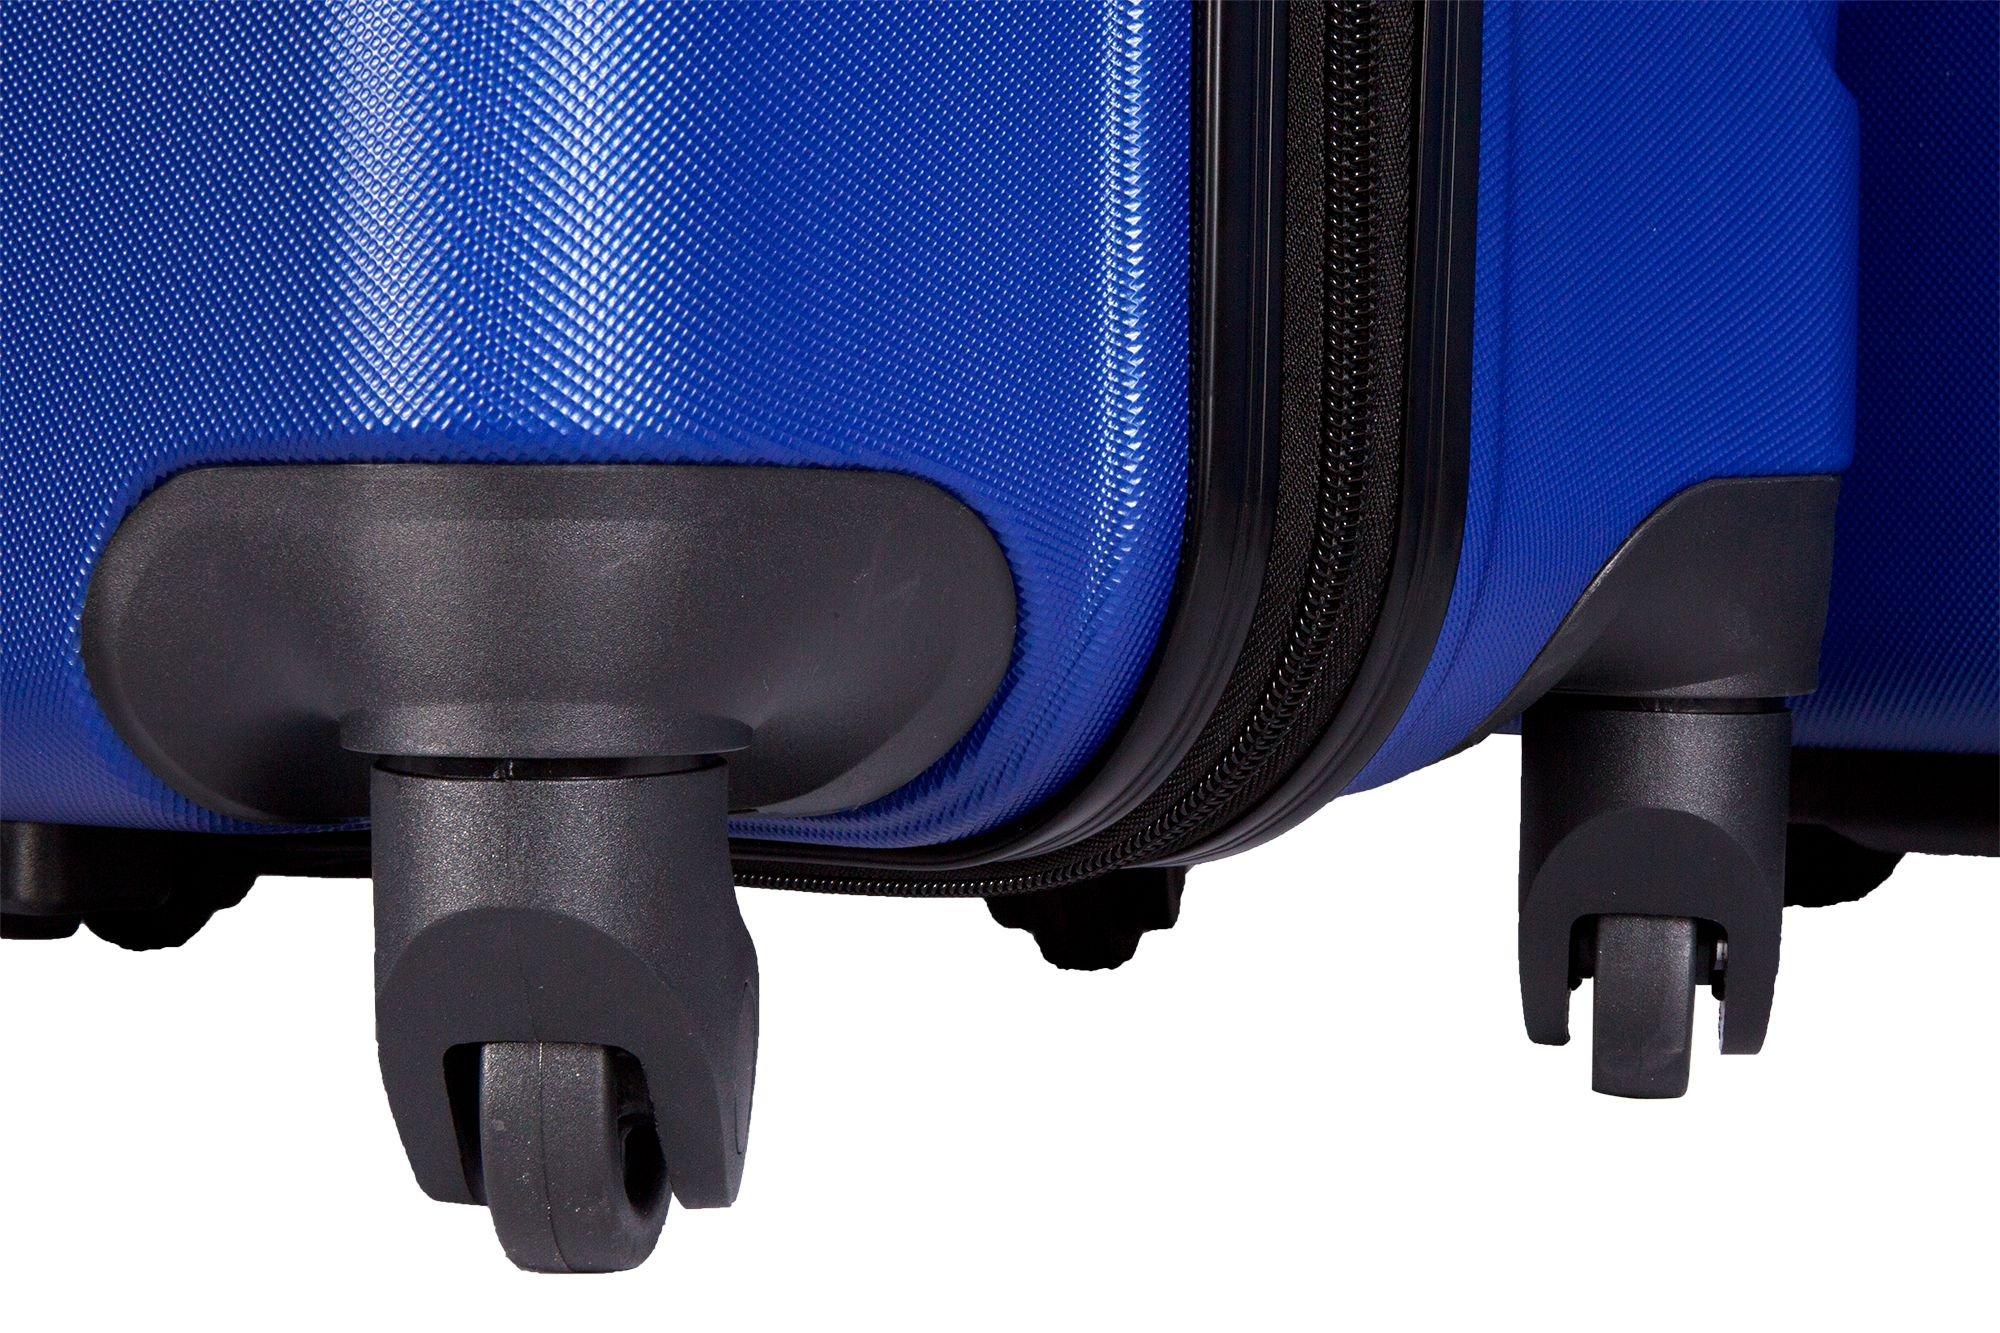 Hainberger-Markenkoffer-3er-Koffer-Set-Trolley-Set-Rollkoffer-Reisekoffer-TSA-S-M-L-6-Farben-whlbar